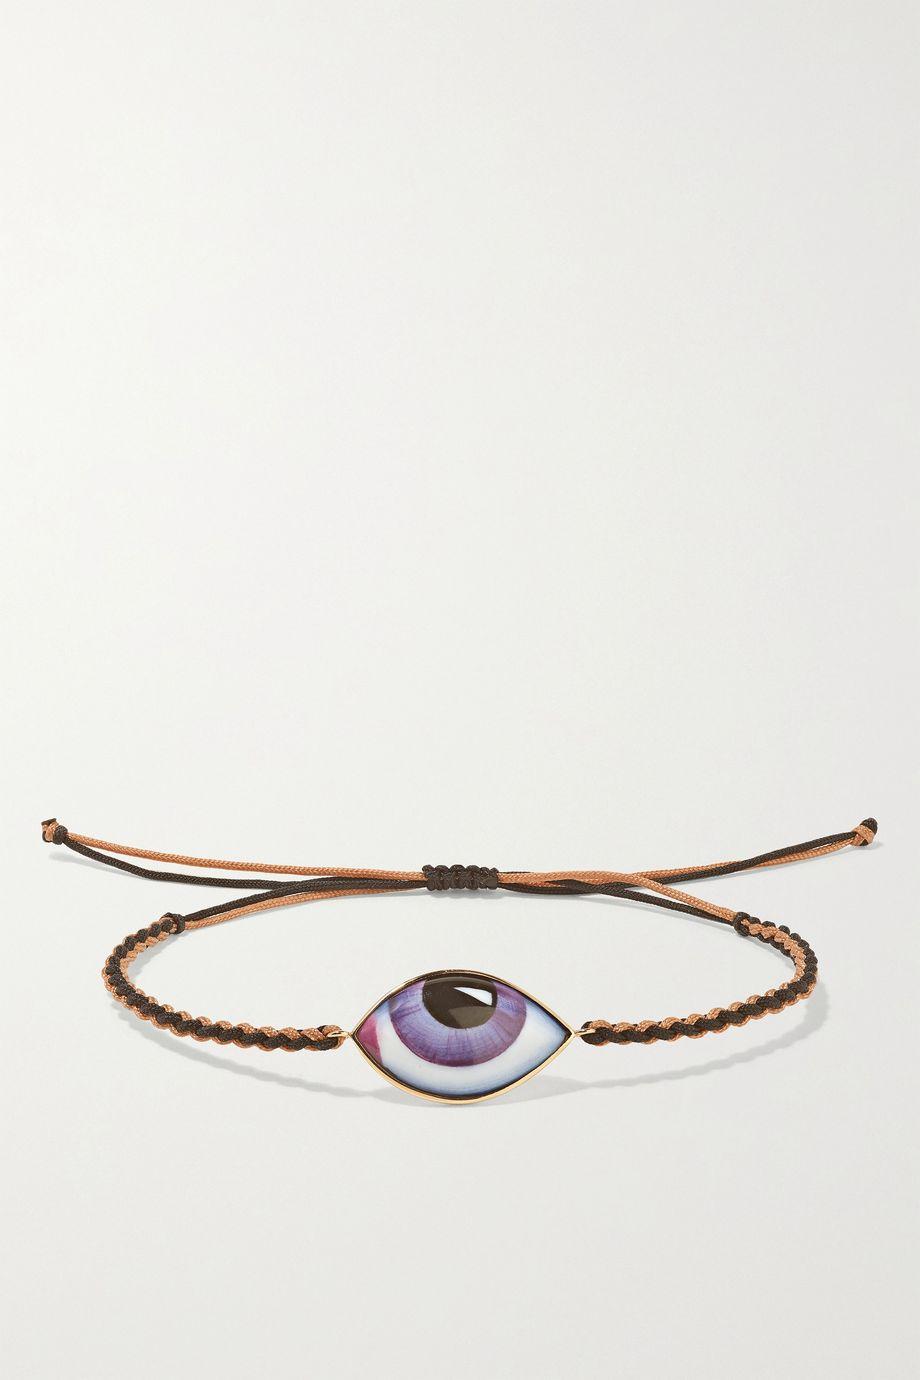 Lito Tu Es Partout 14-karat rose gold, macramé and enamel bracelet